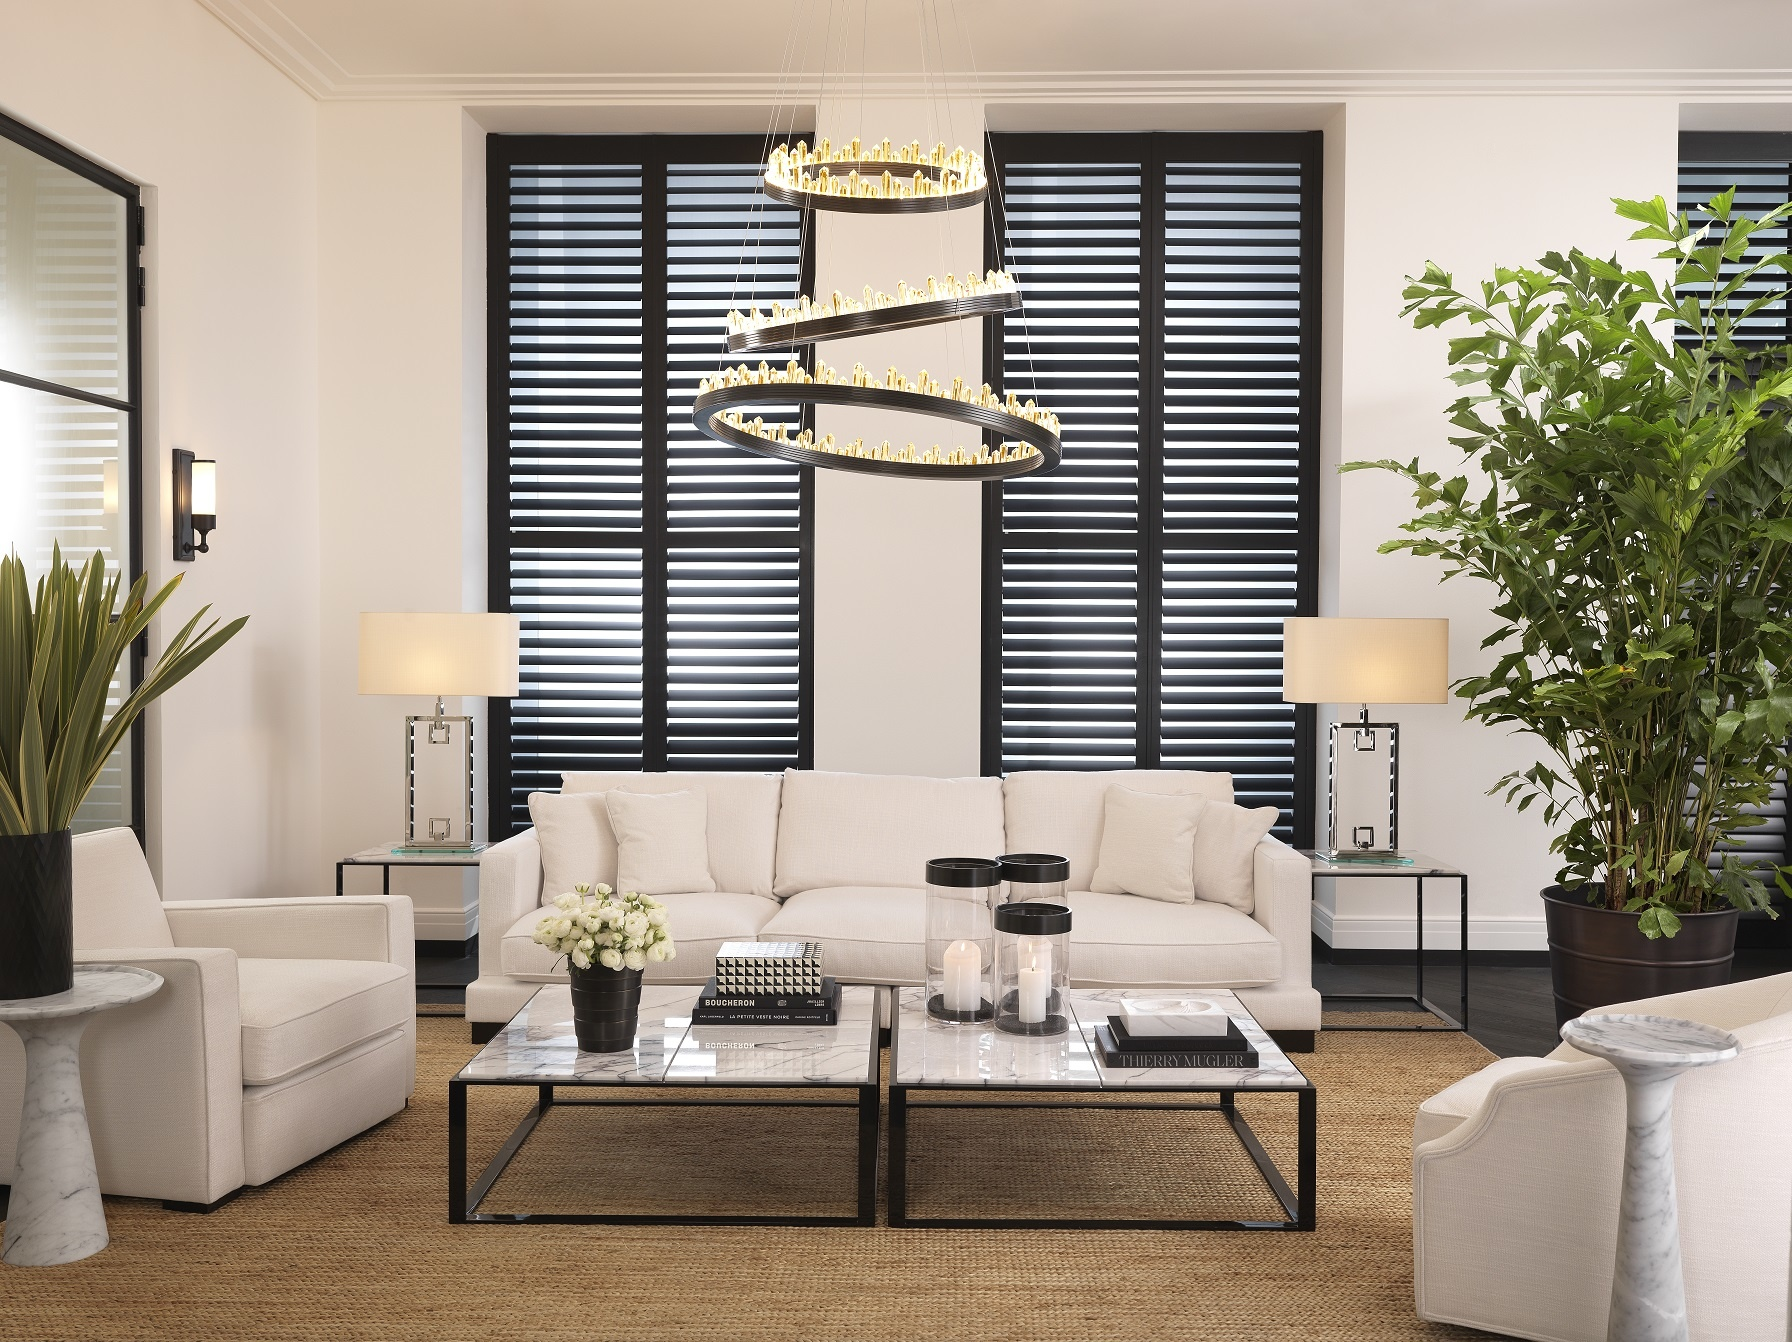 Shop The Room | Luxury Living >